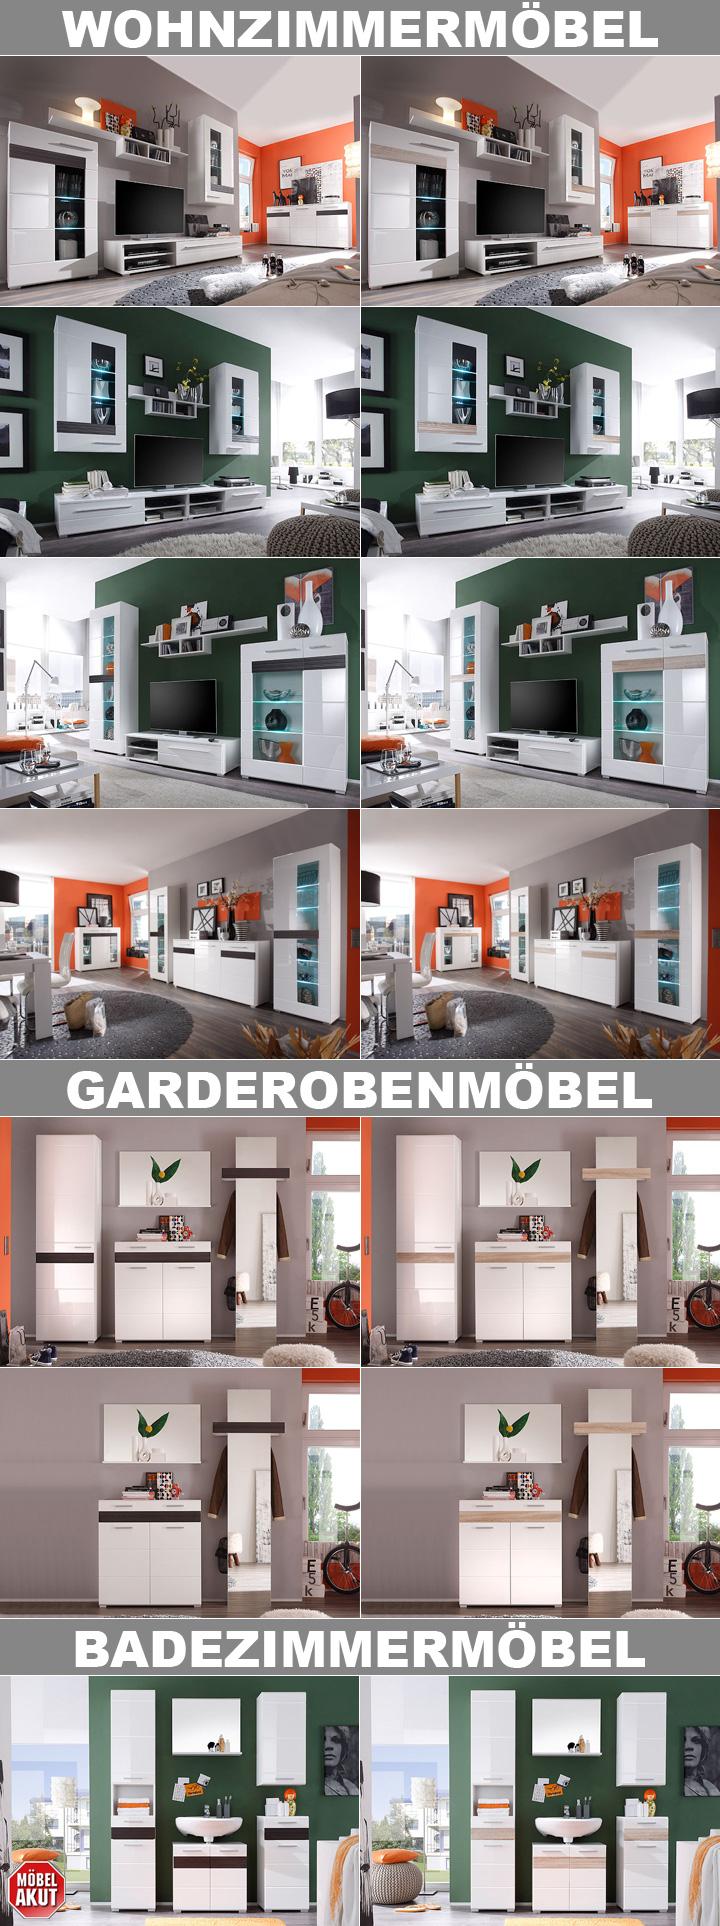 badezimmerset mezzo wei hochglanz sonoma s gerau hell. Black Bedroom Furniture Sets. Home Design Ideas